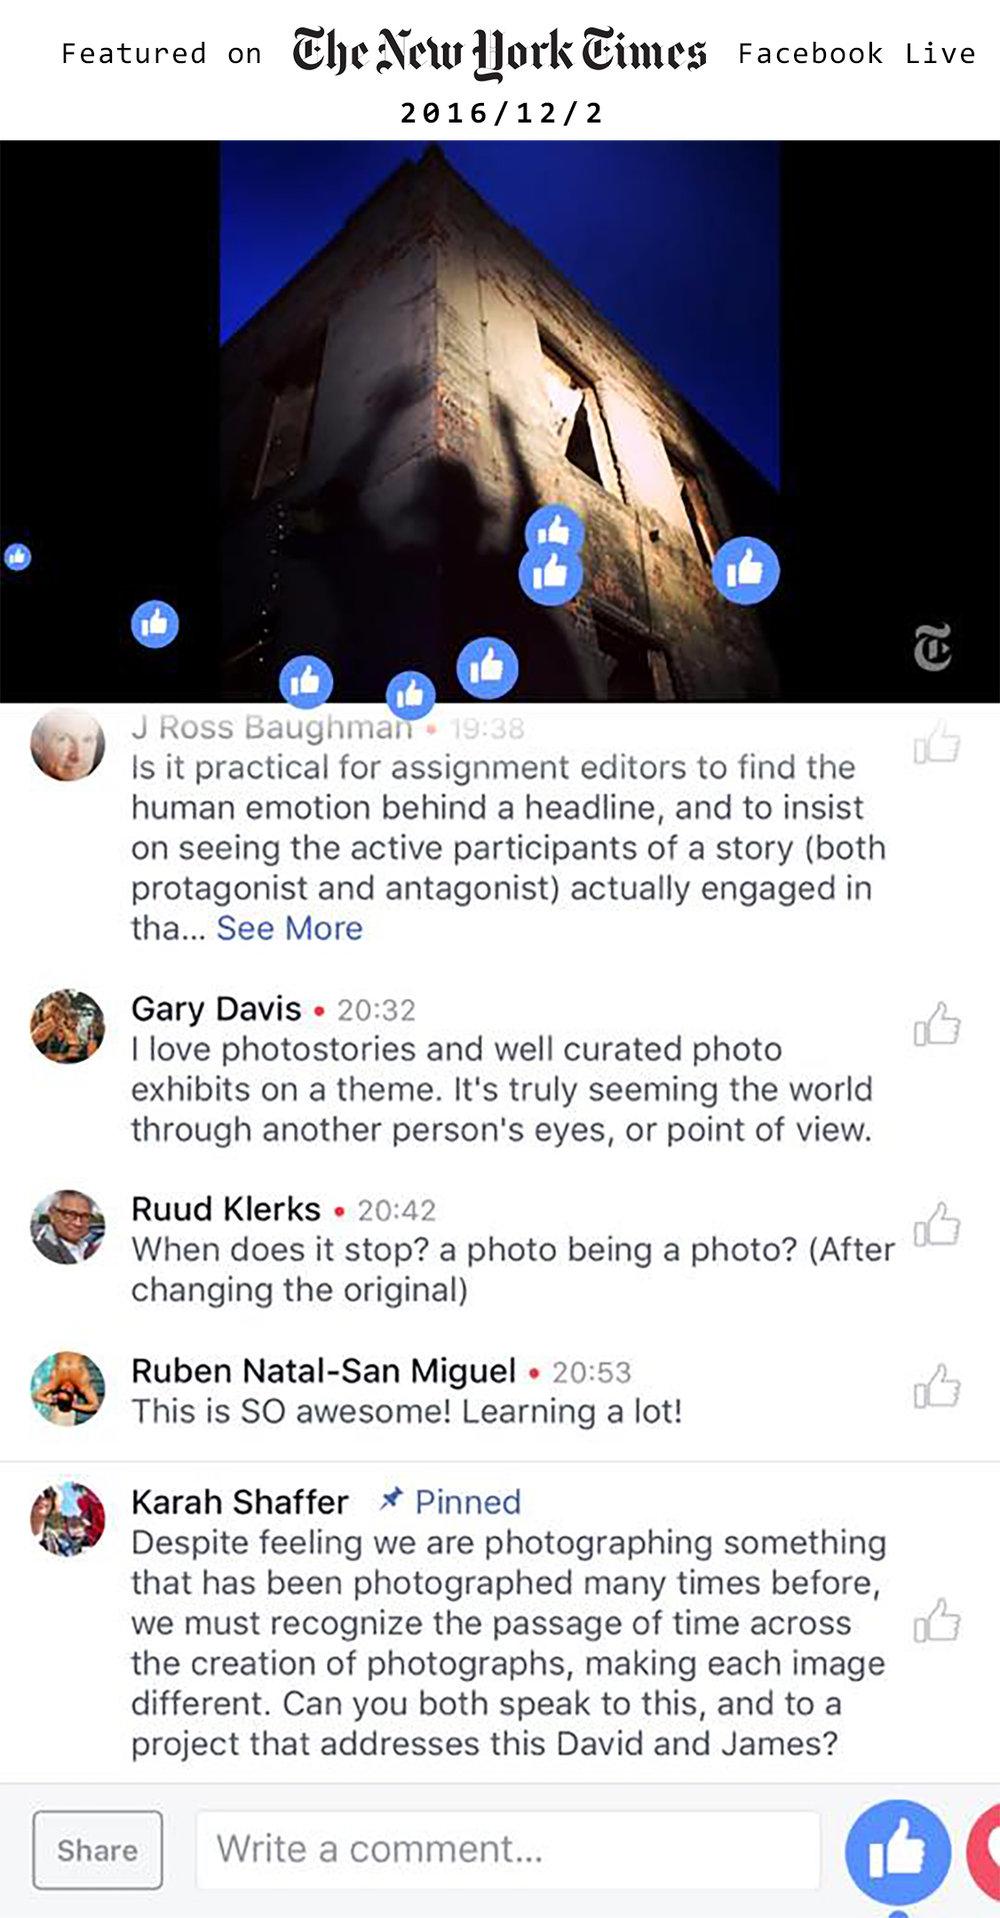 20161202_NY_Times_Facebook_live.jpg